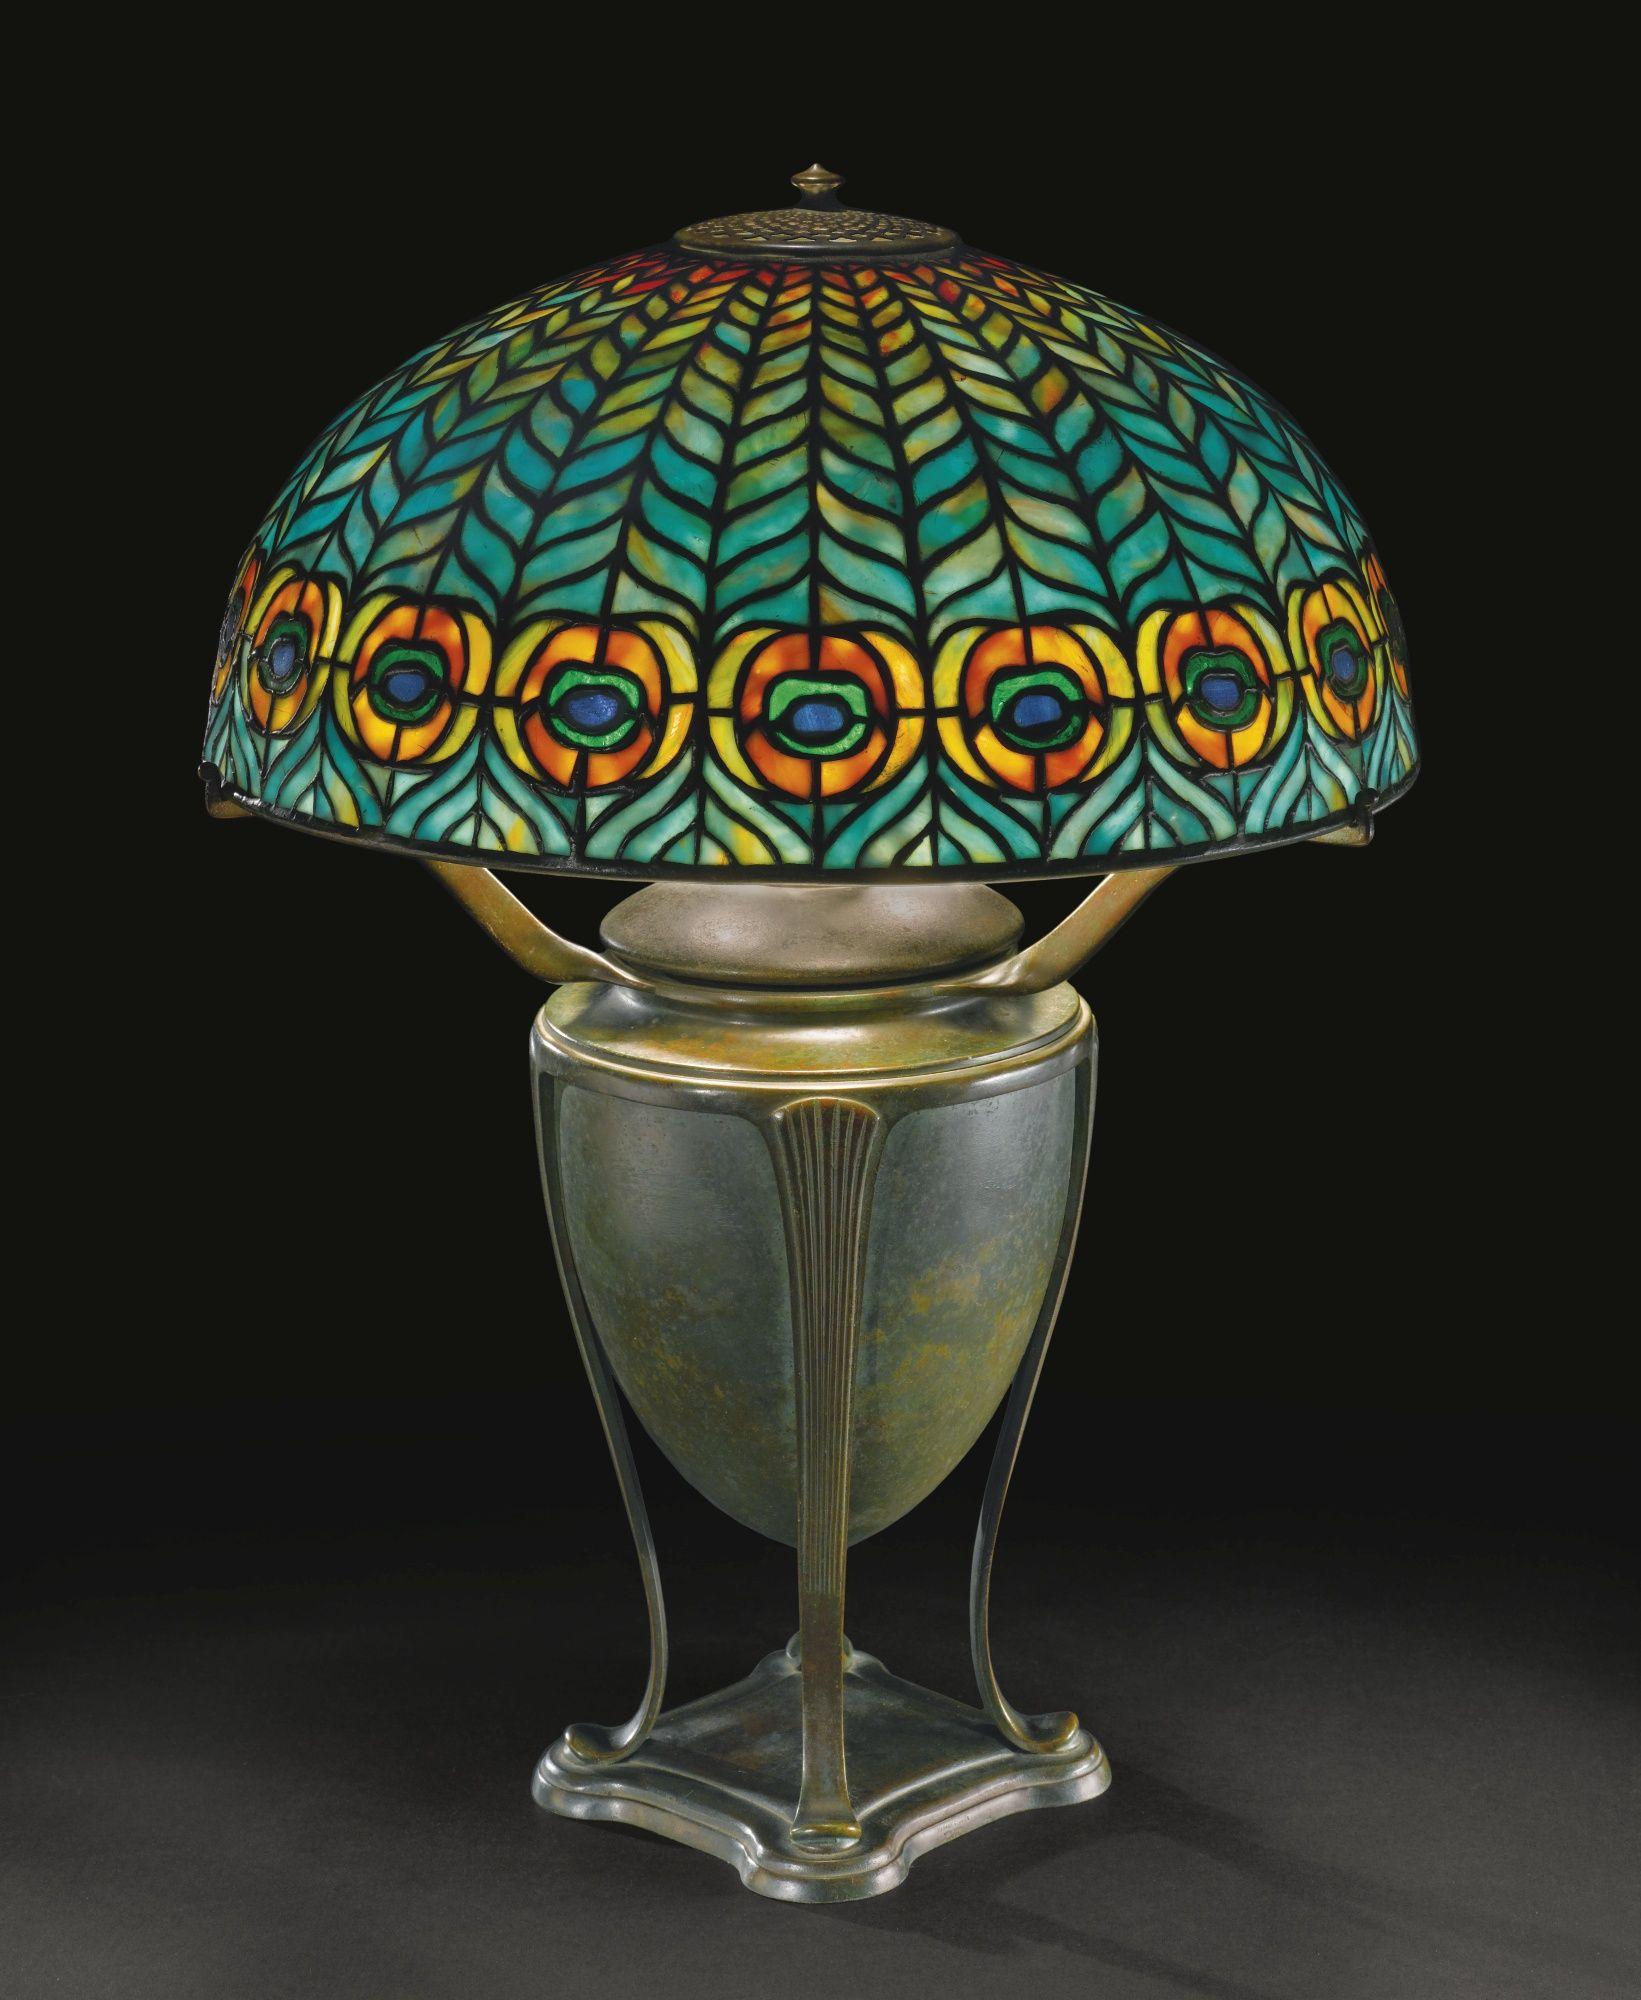 "TIFFANY STUDIOS ""PEACOCK"" TABLE LAMP, circa 1904"